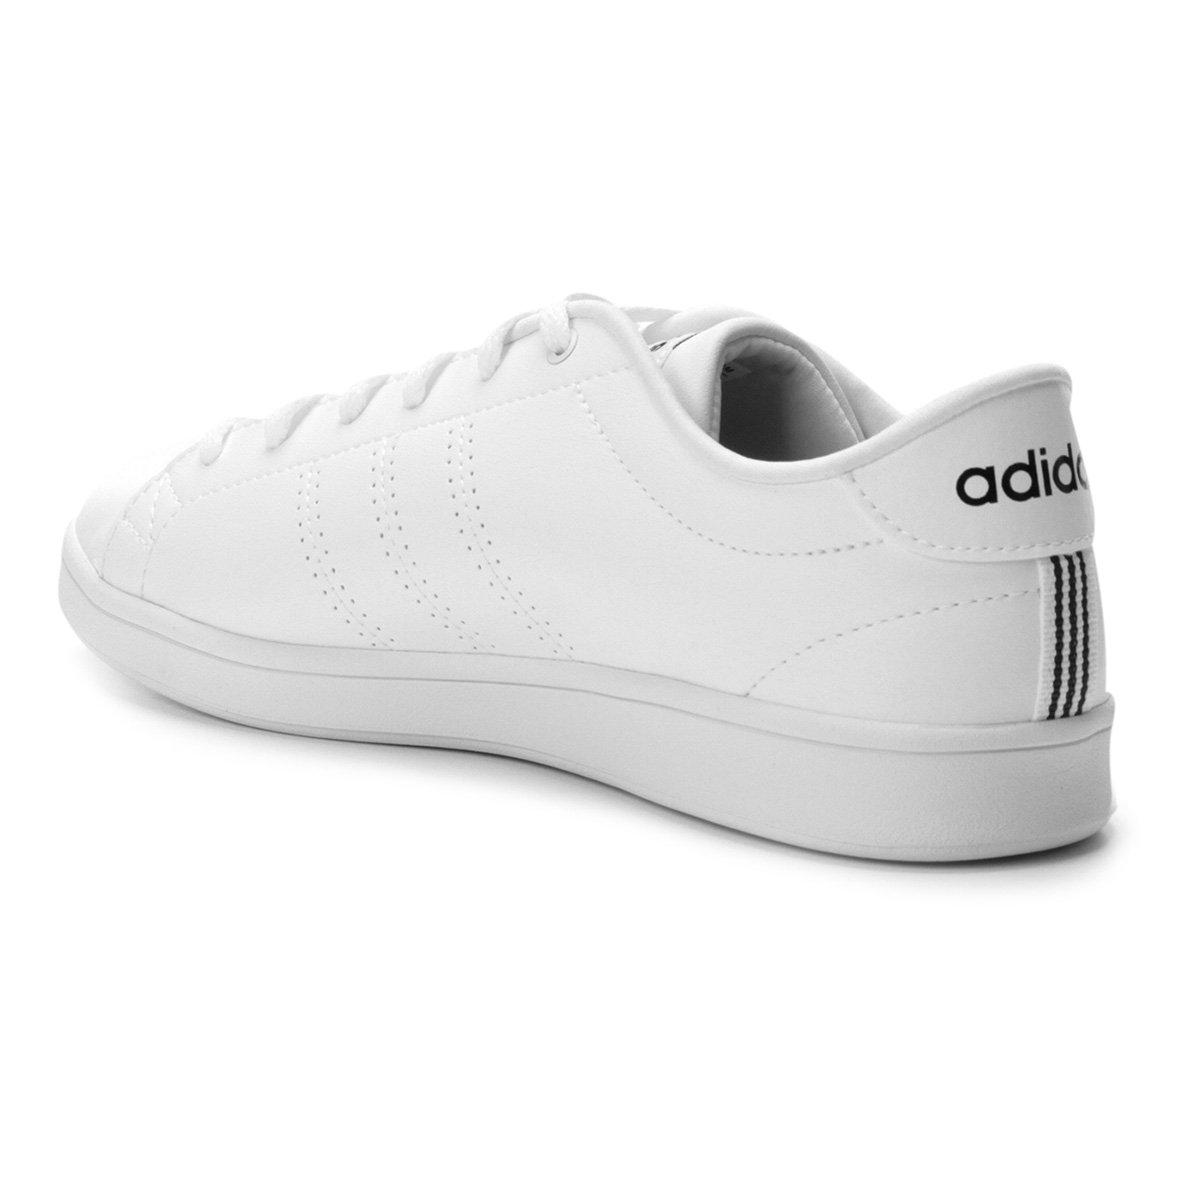 Tênis Adidas Advantage Clean Qt Feminino - Branco e Preto - Compre ... bdb391b0ad8ad